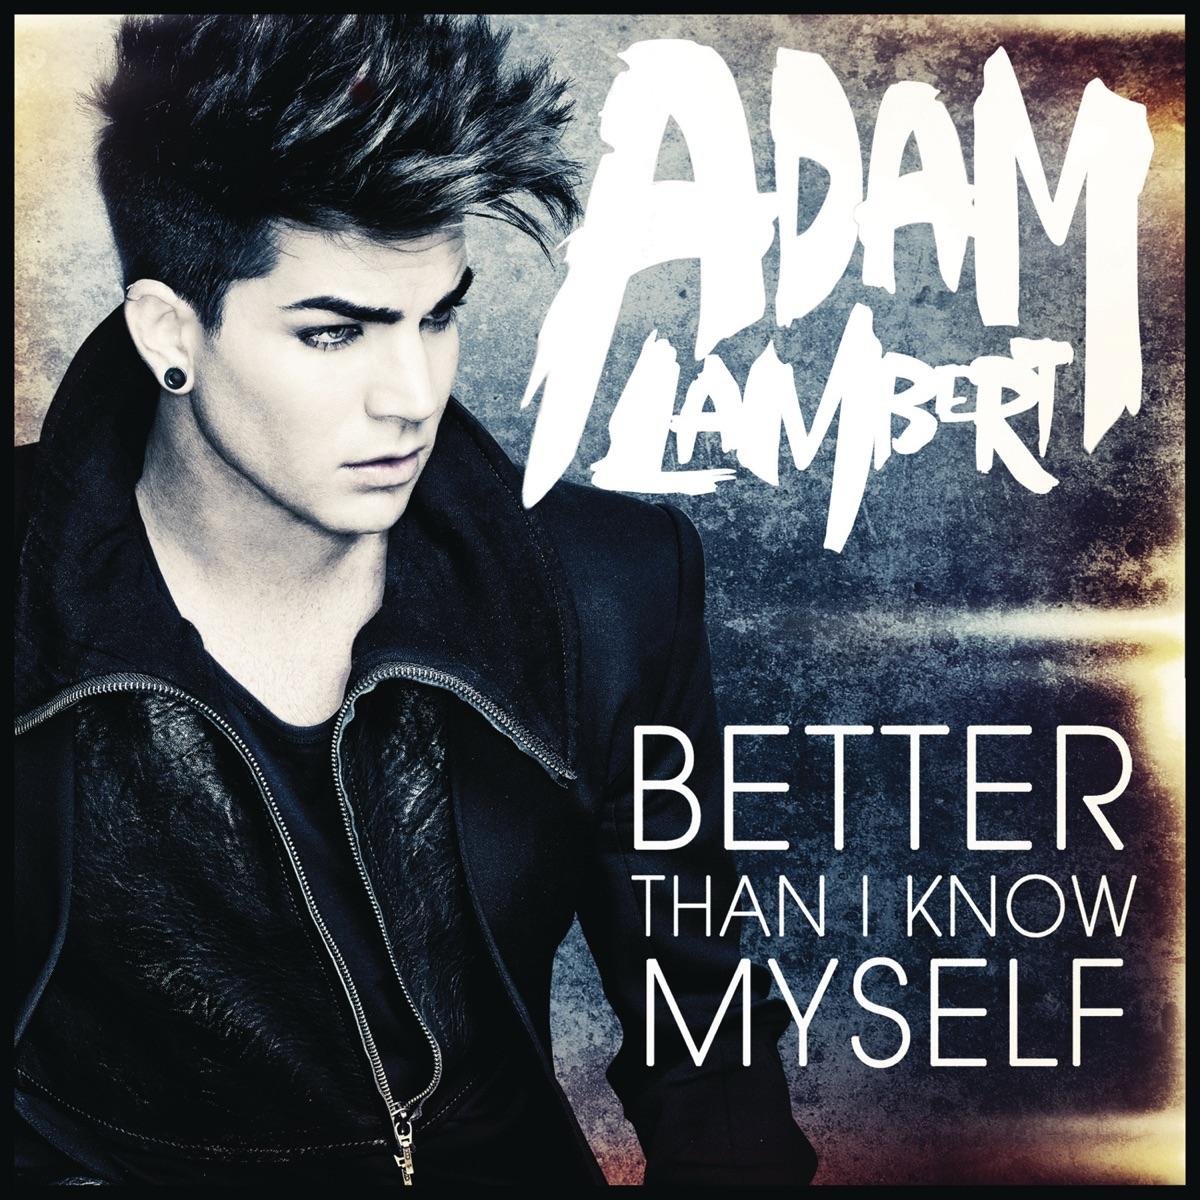 Adam lambert debuts 'better than i know myself' video | hollywood.